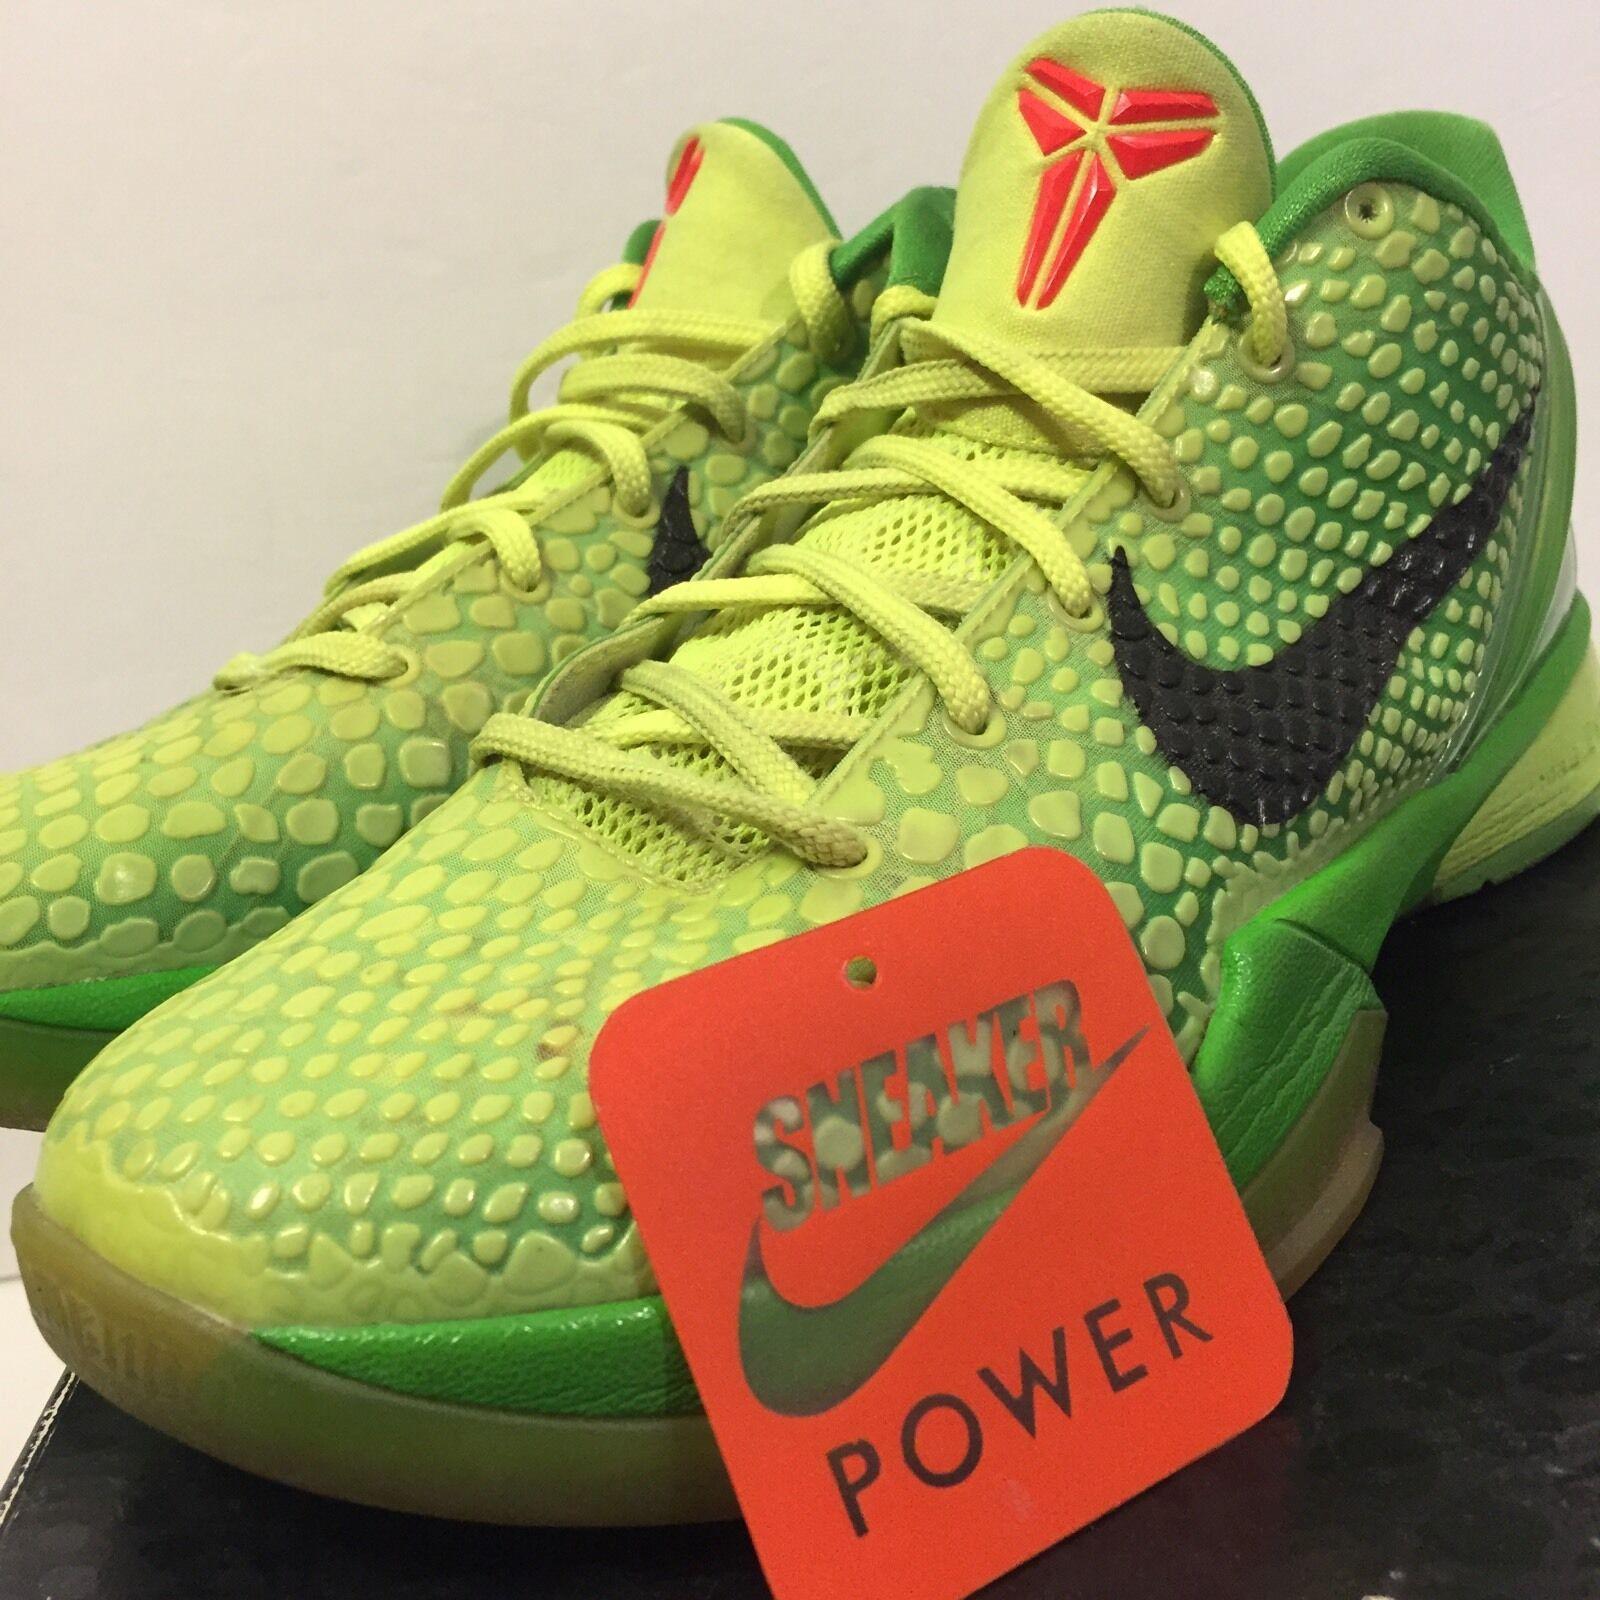 Nike zoom kobe vi 6 verde sz 8,5 grinch volt mela verde 6 natale natale rosso 429659-701 776395